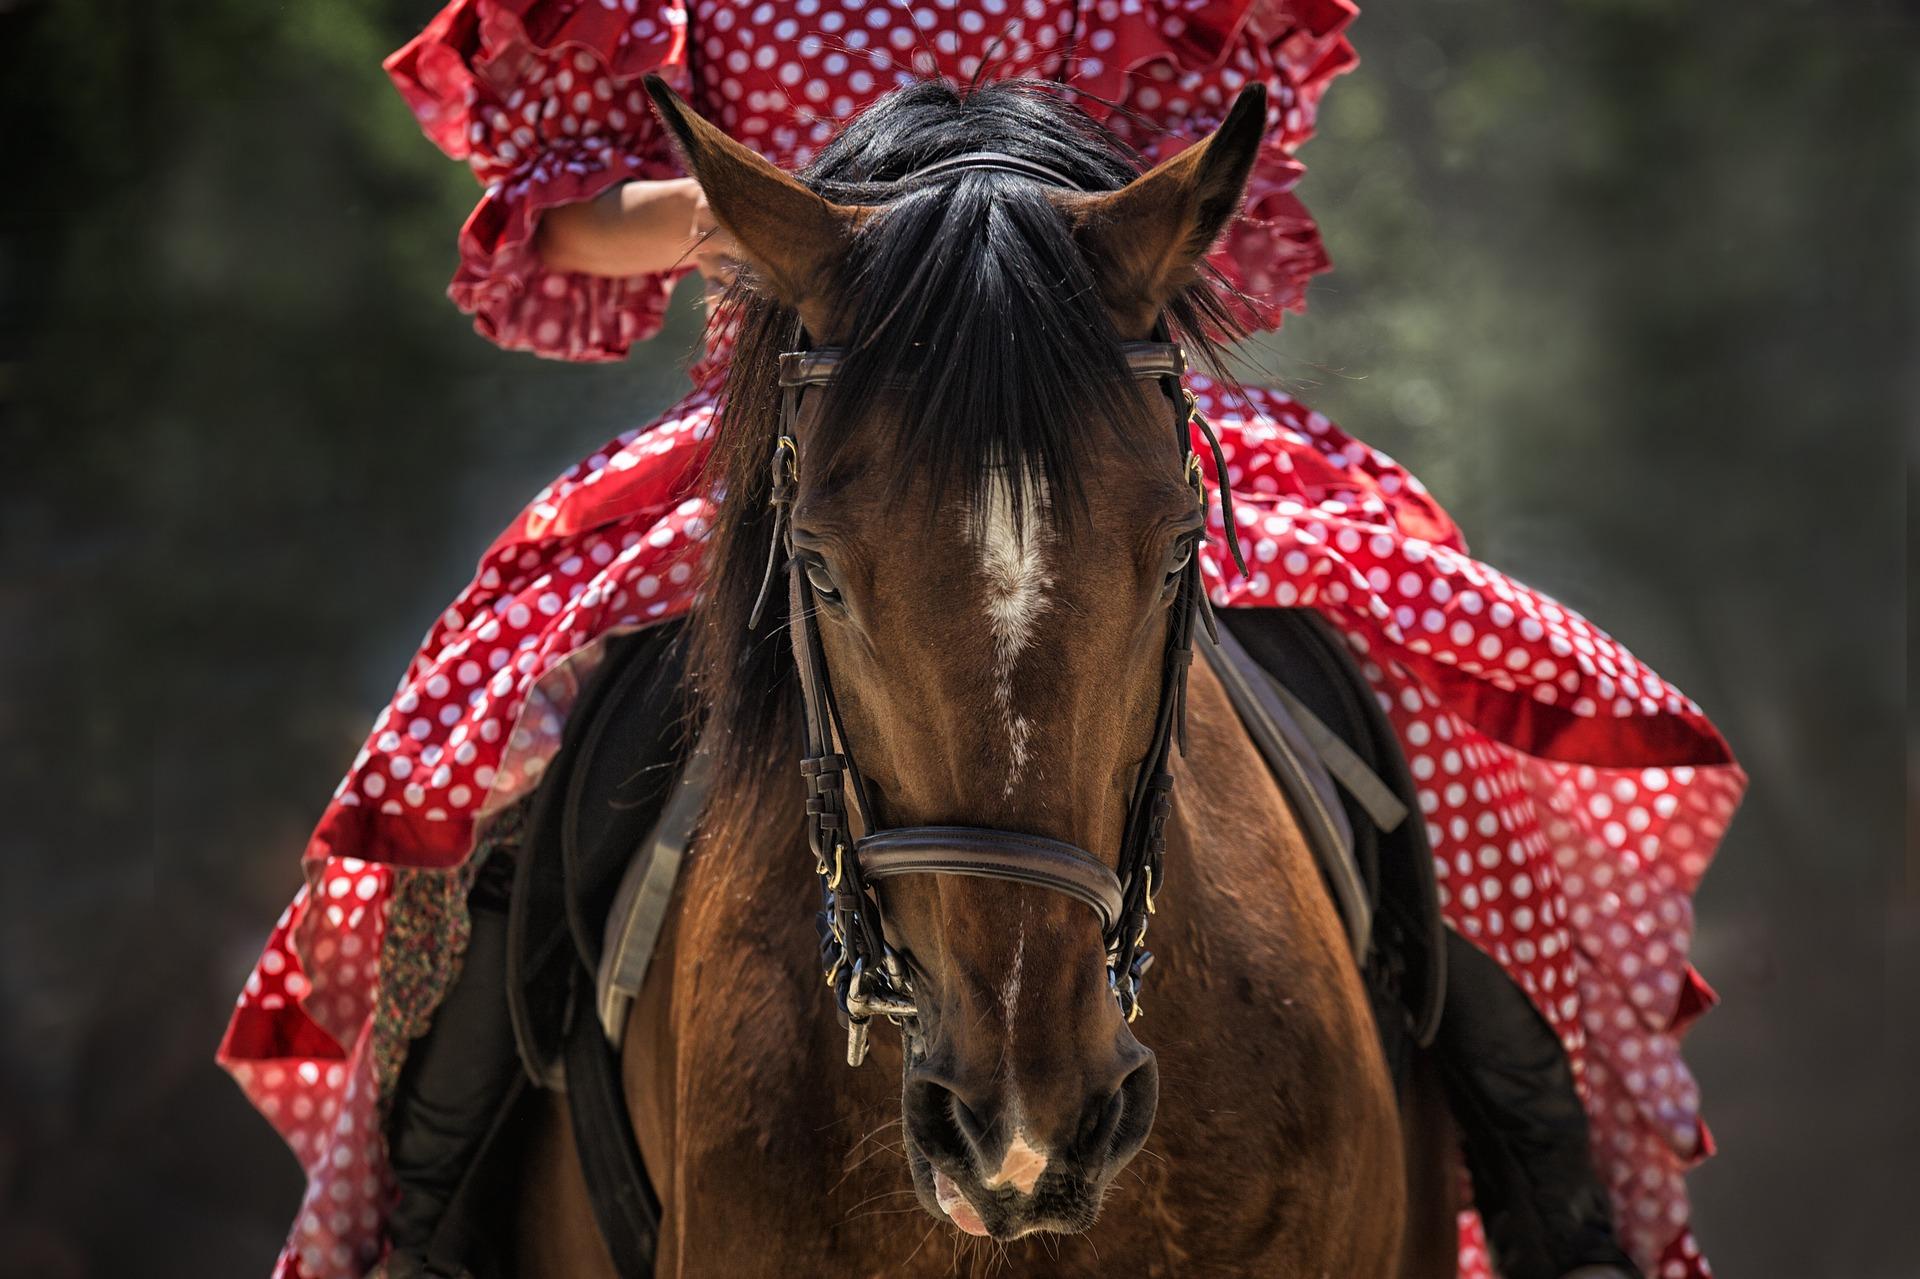 horse-1139142_1920.jpg